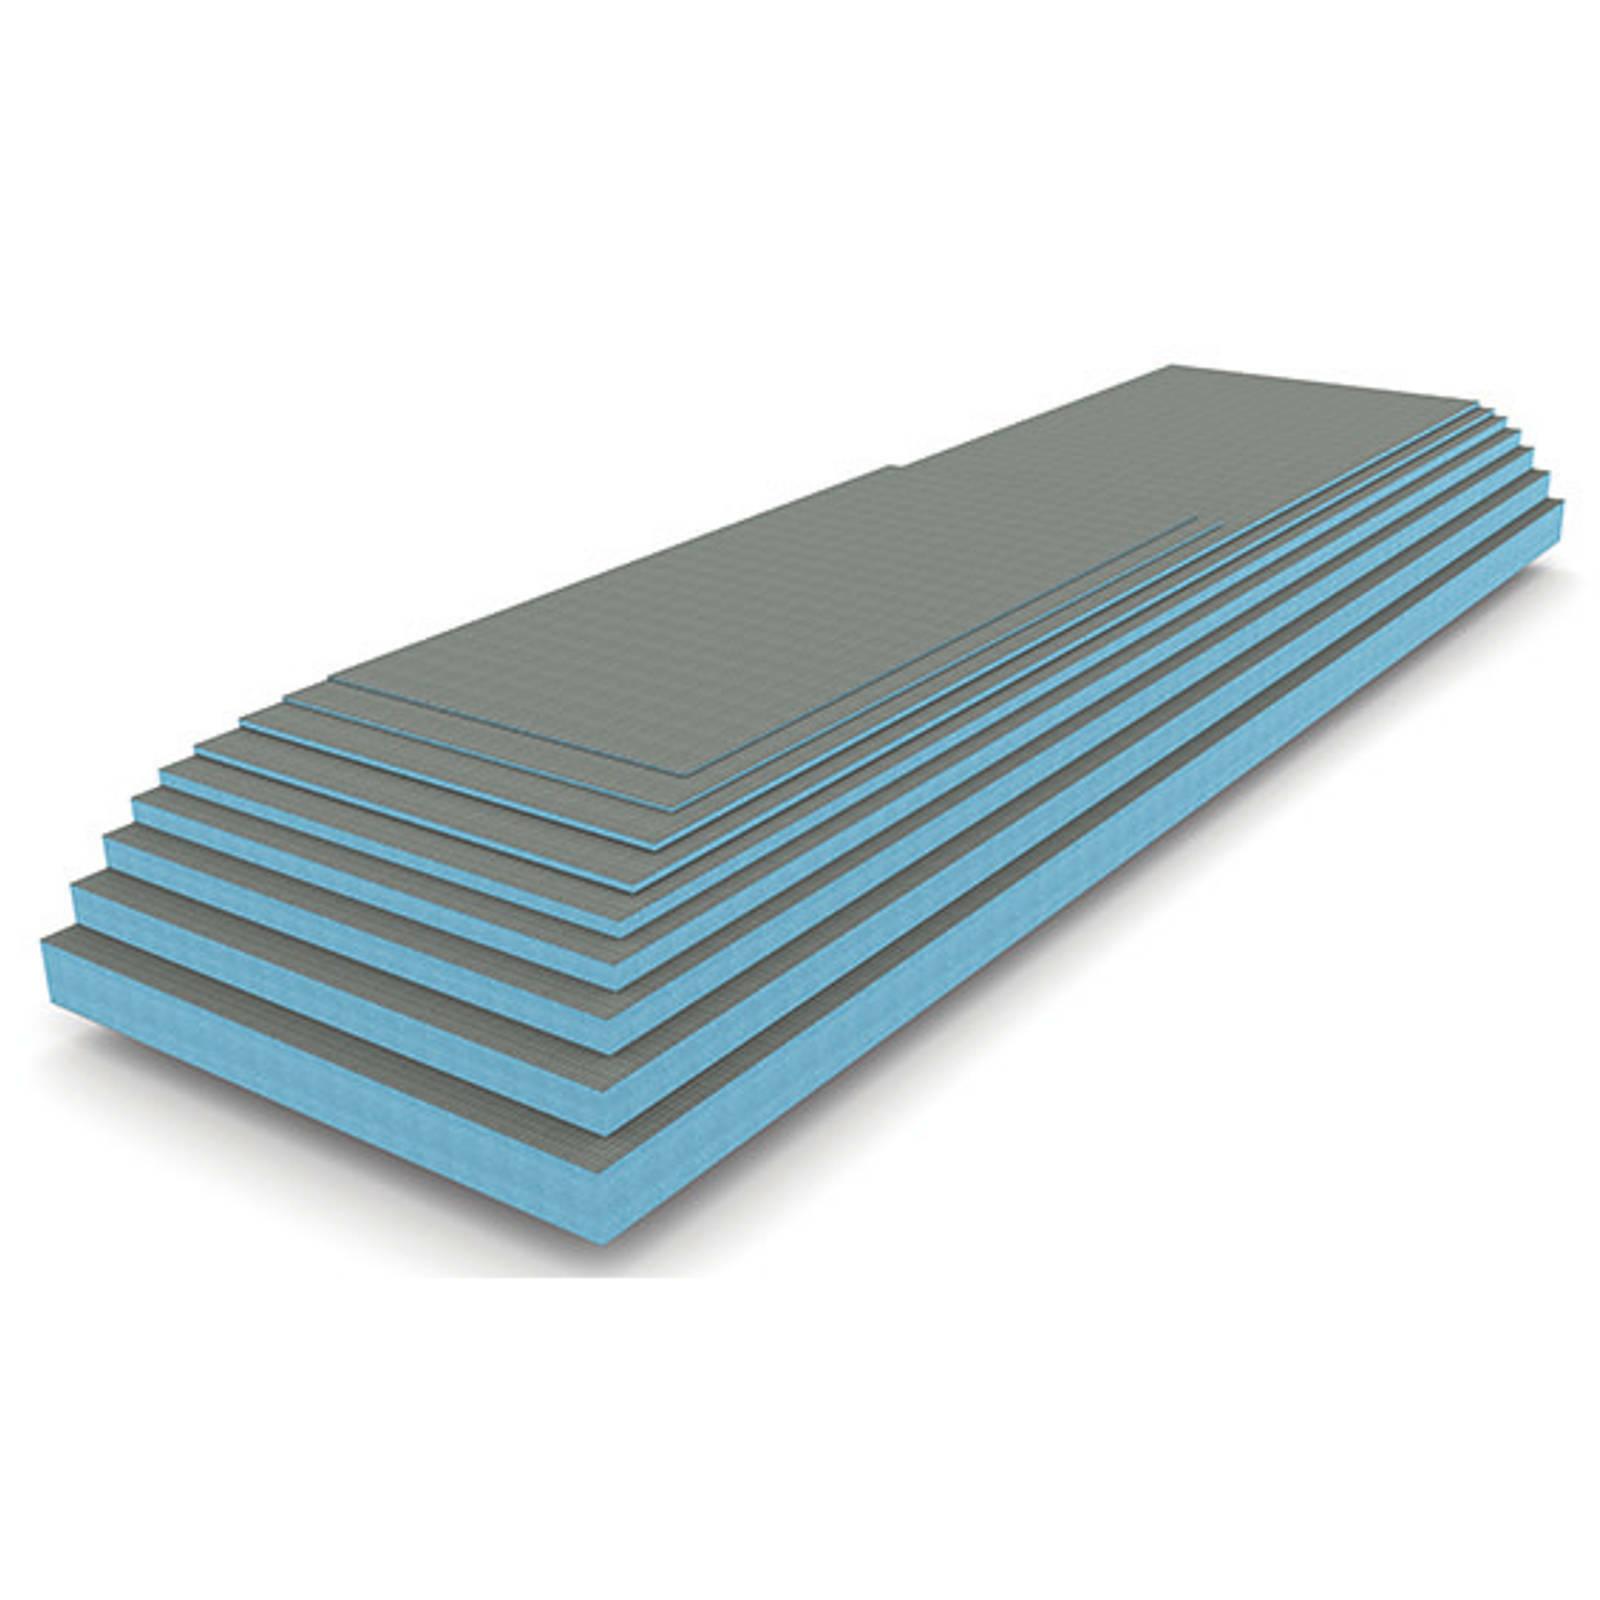 13 M²) Building Blocks XPS 0 1/4in Rigid Foam Haftuntergrun